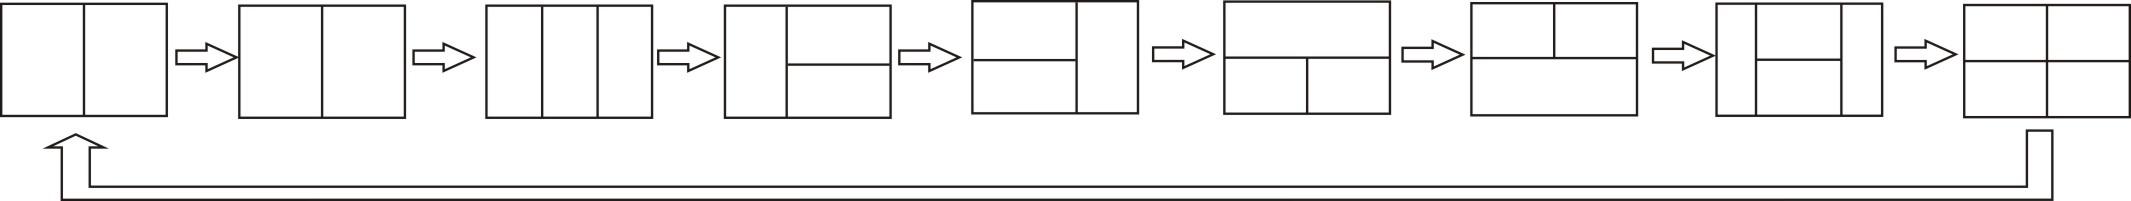 7inch Quad Monitor Four Splits Switch